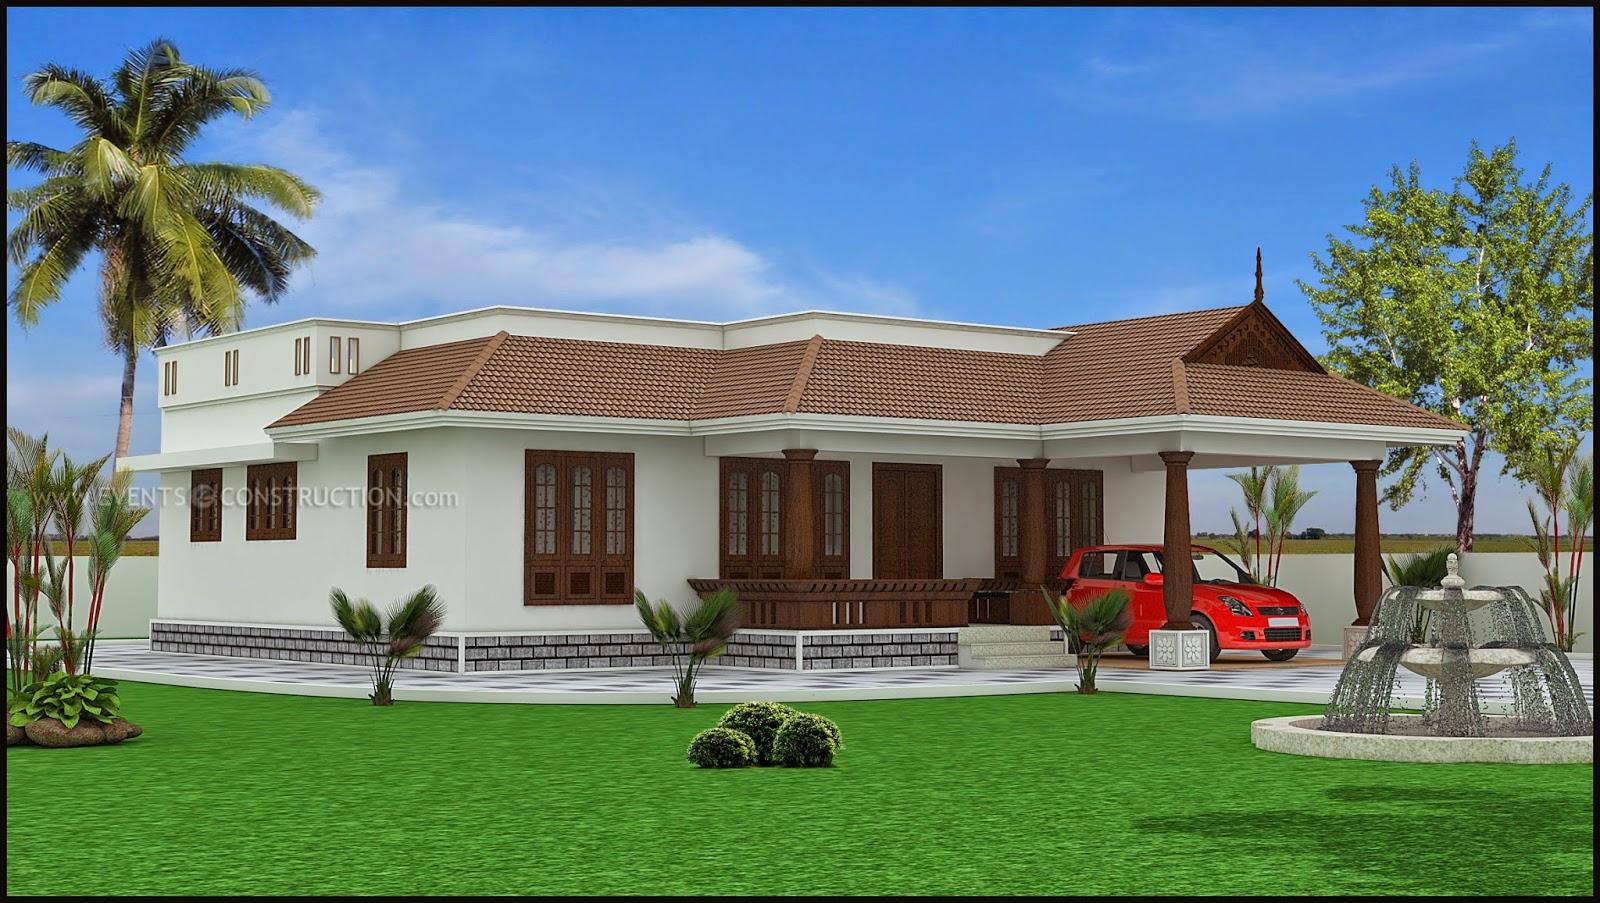 Evens Construction Pvt Ltd: Single Storey Kerala House Design